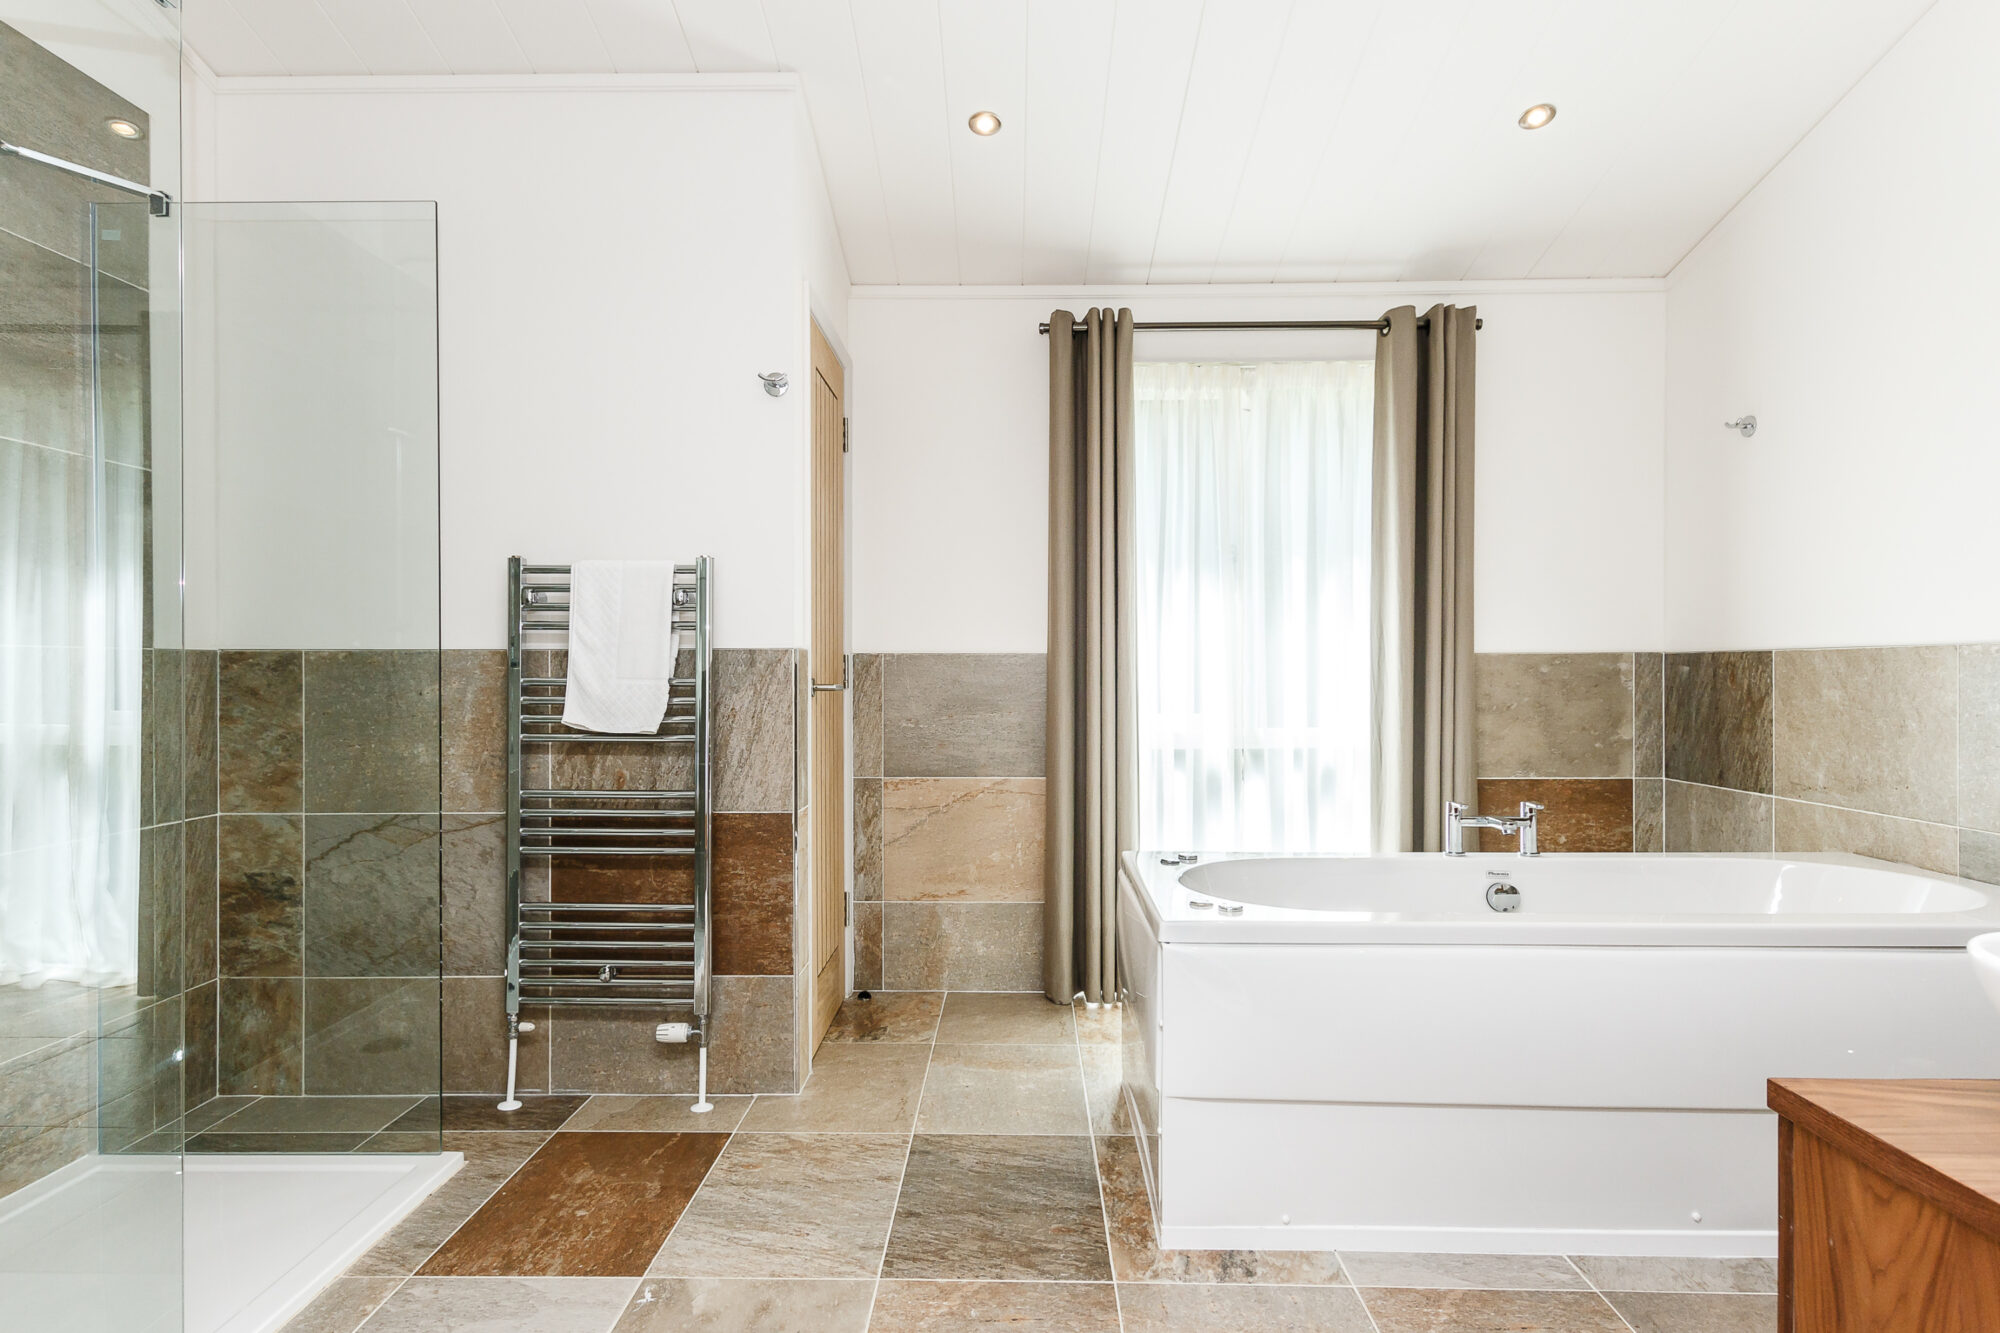 Interior shot of a bathroom in a Bath Mill lodge